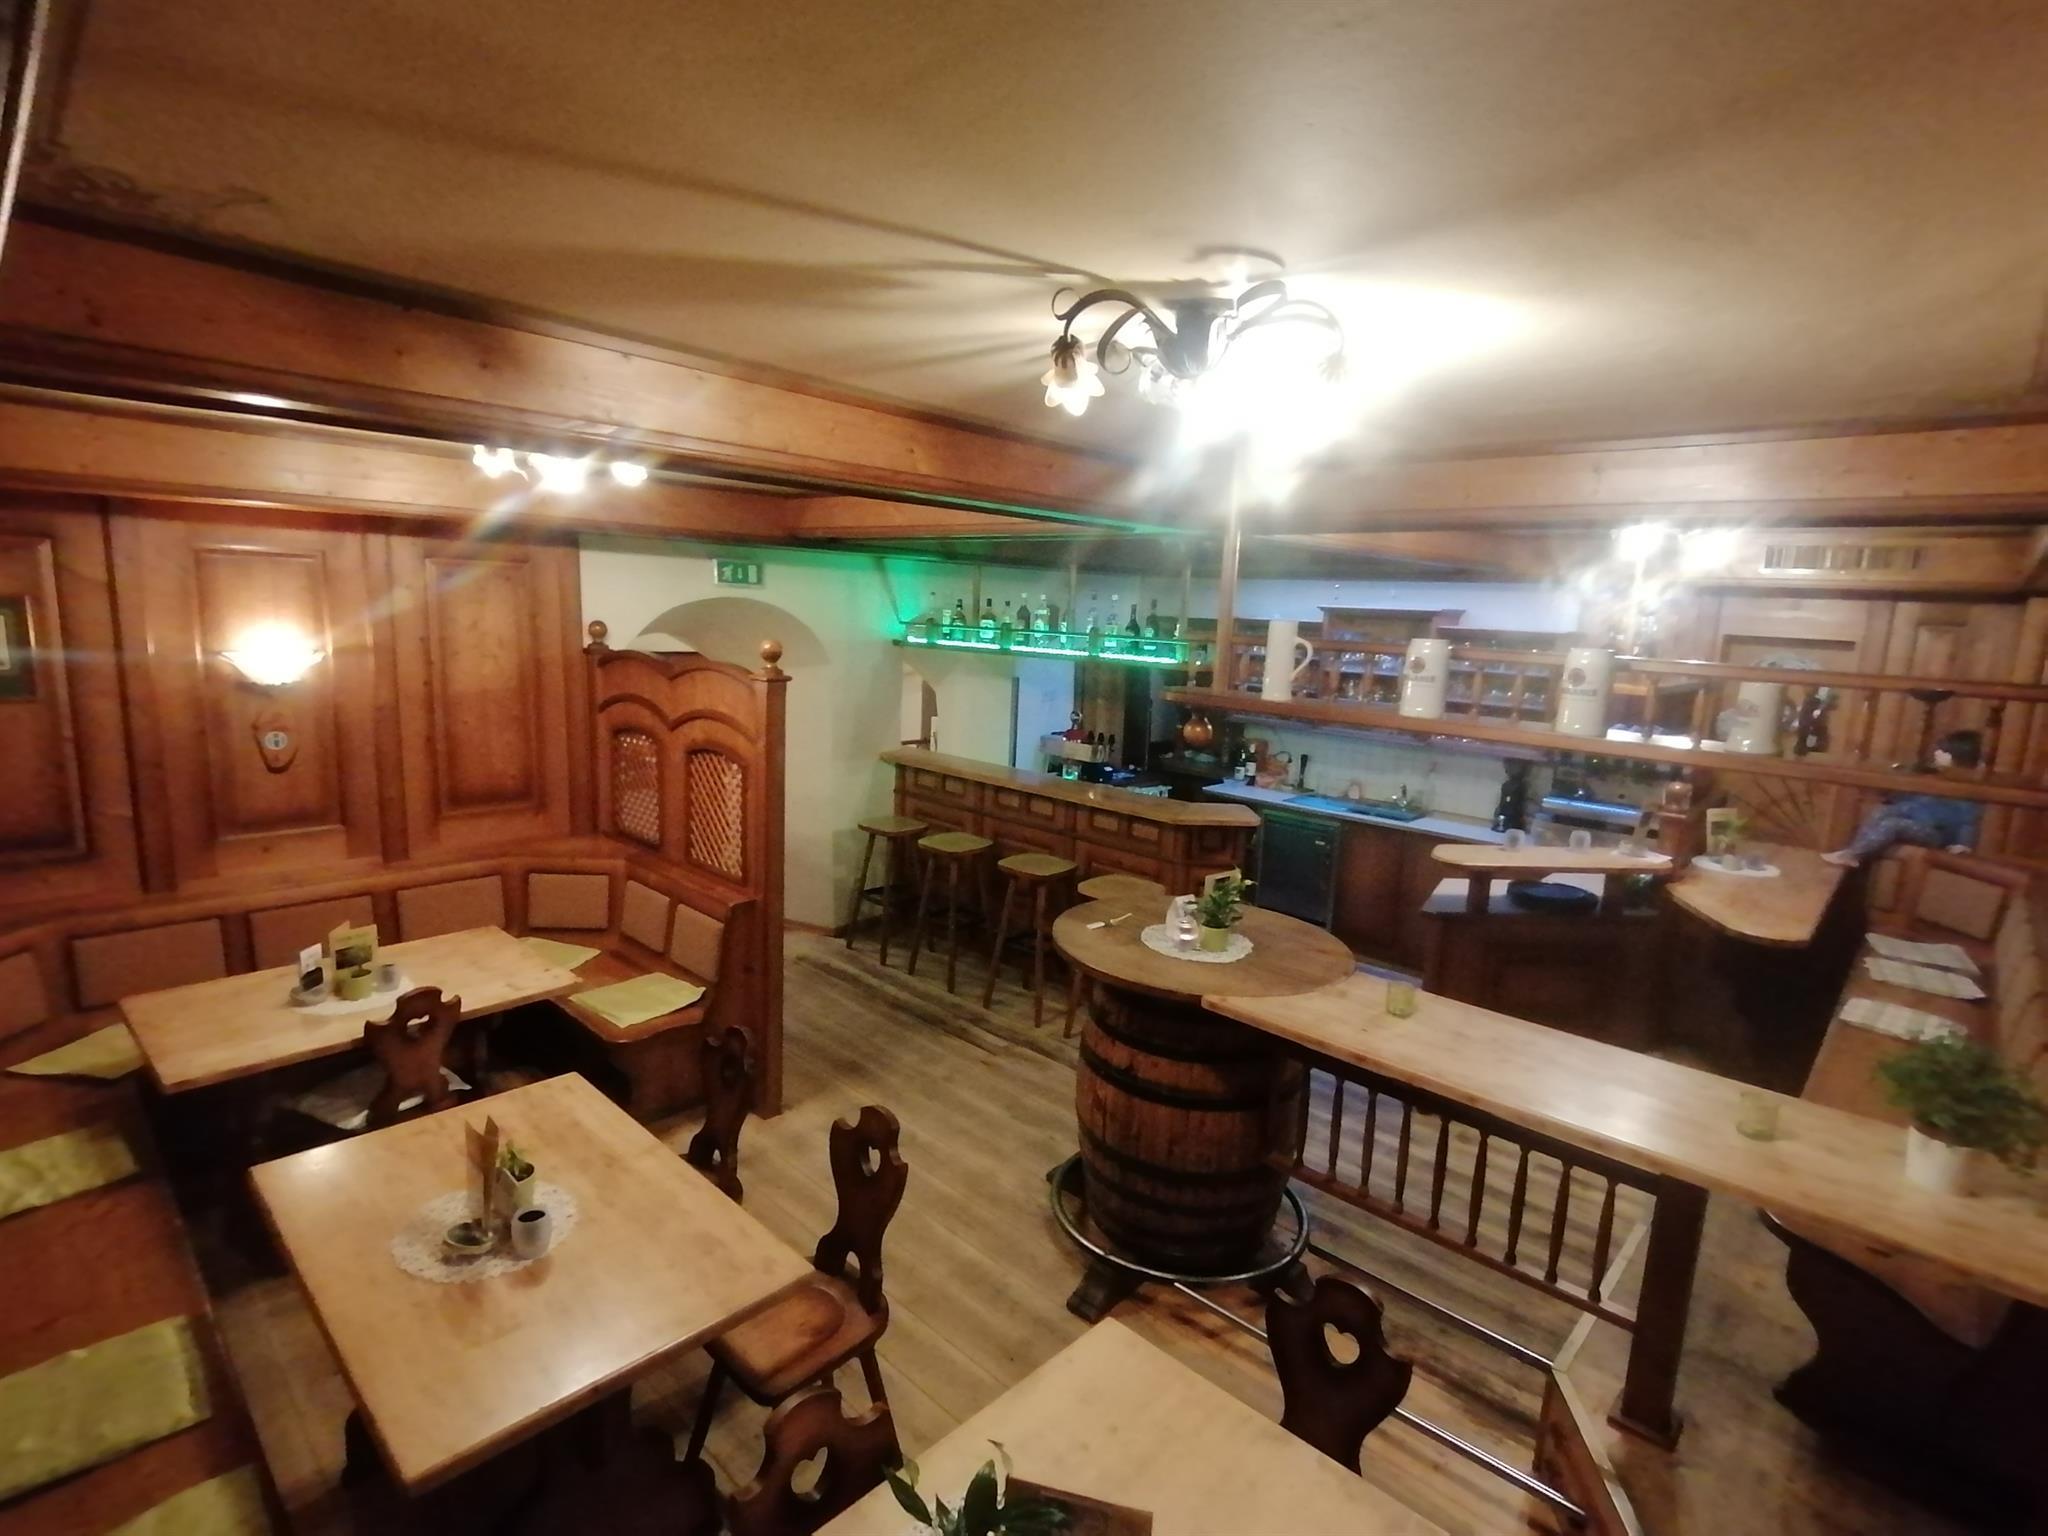 Cafe-Bar-Moar-im-Walde-C-Ruediger-Staller.jpg